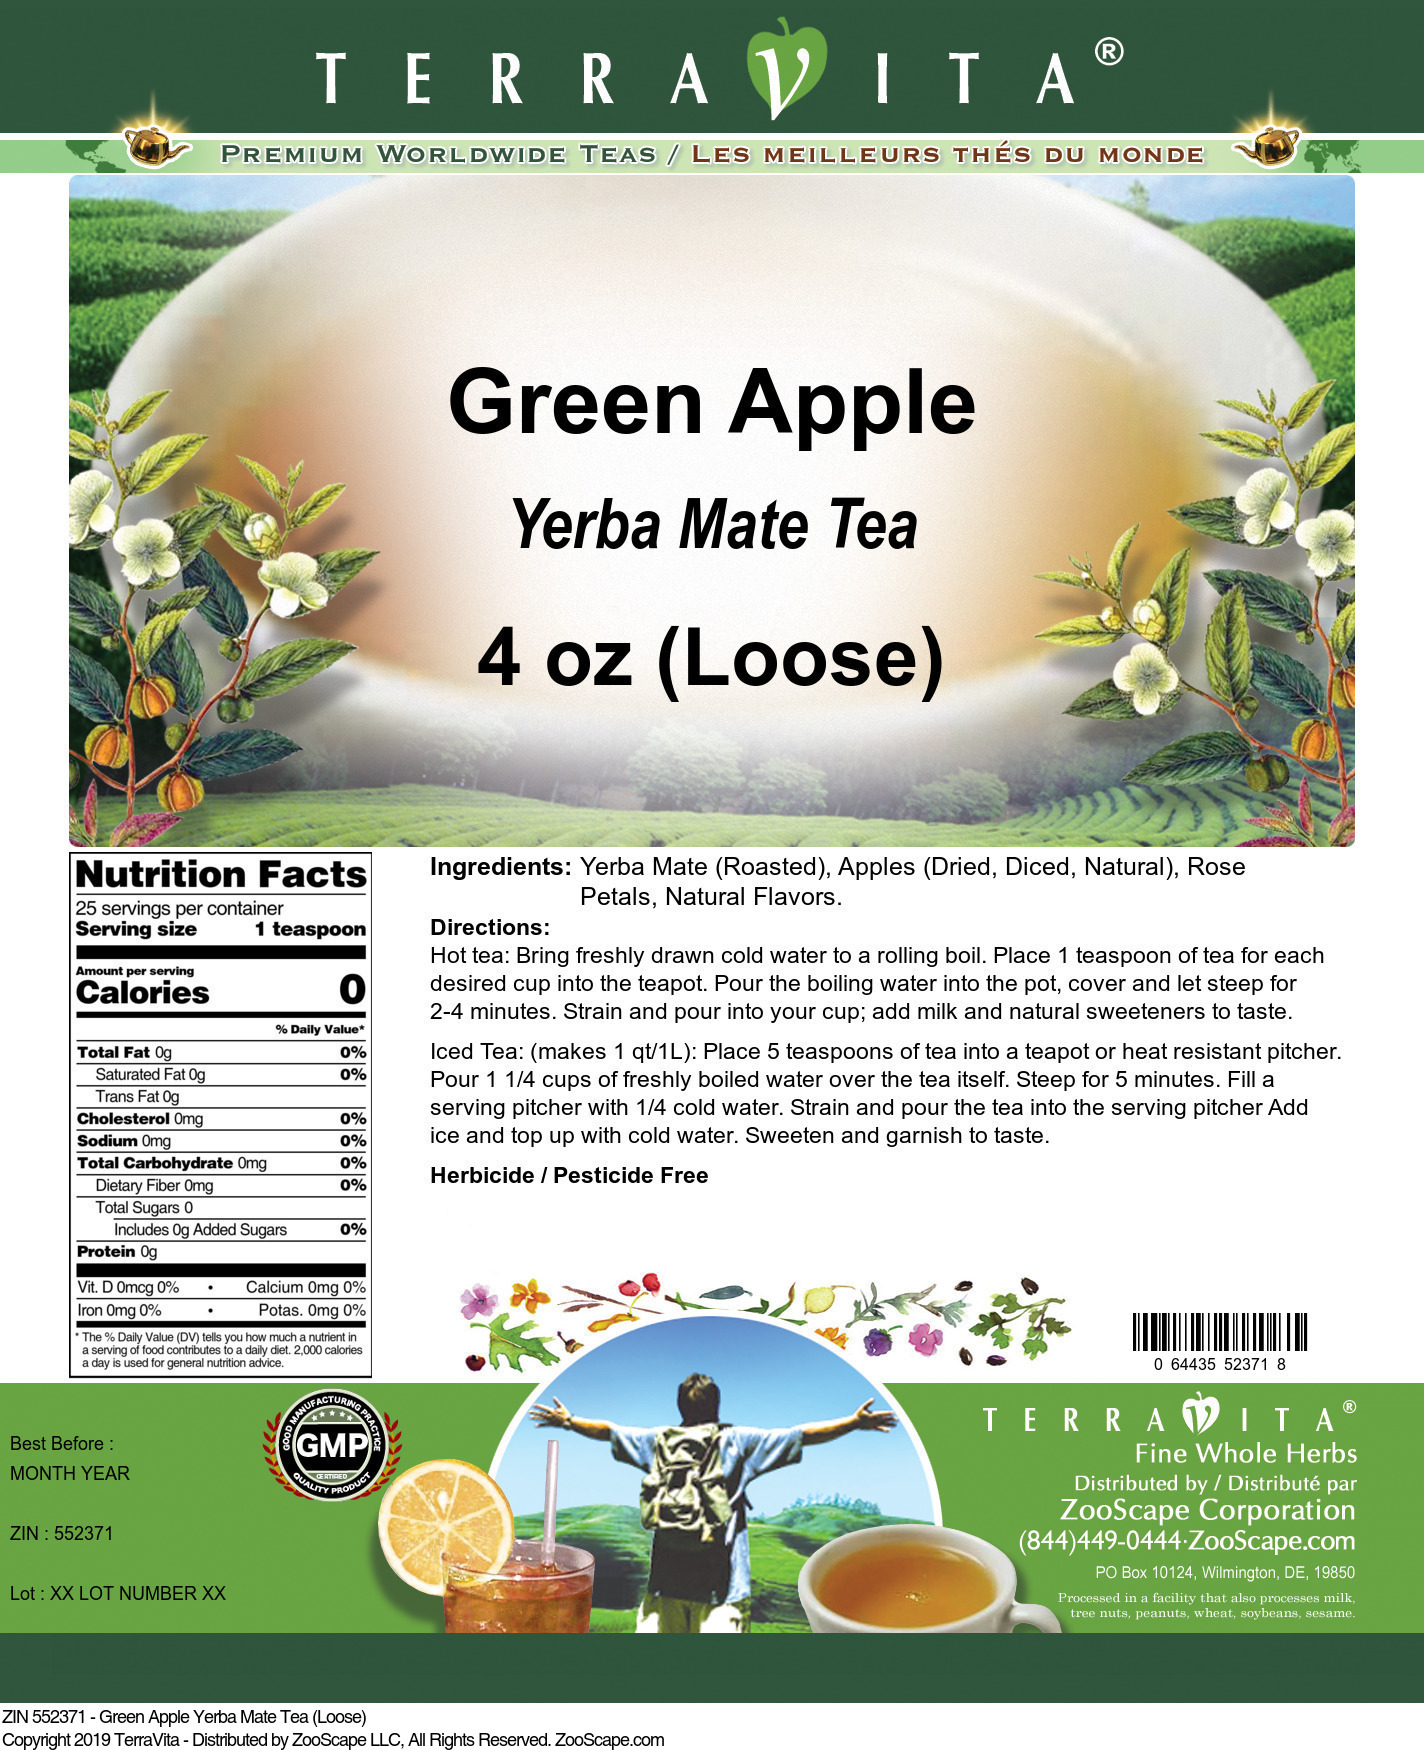 Green Apple Yerba Mate Tea (Loose)